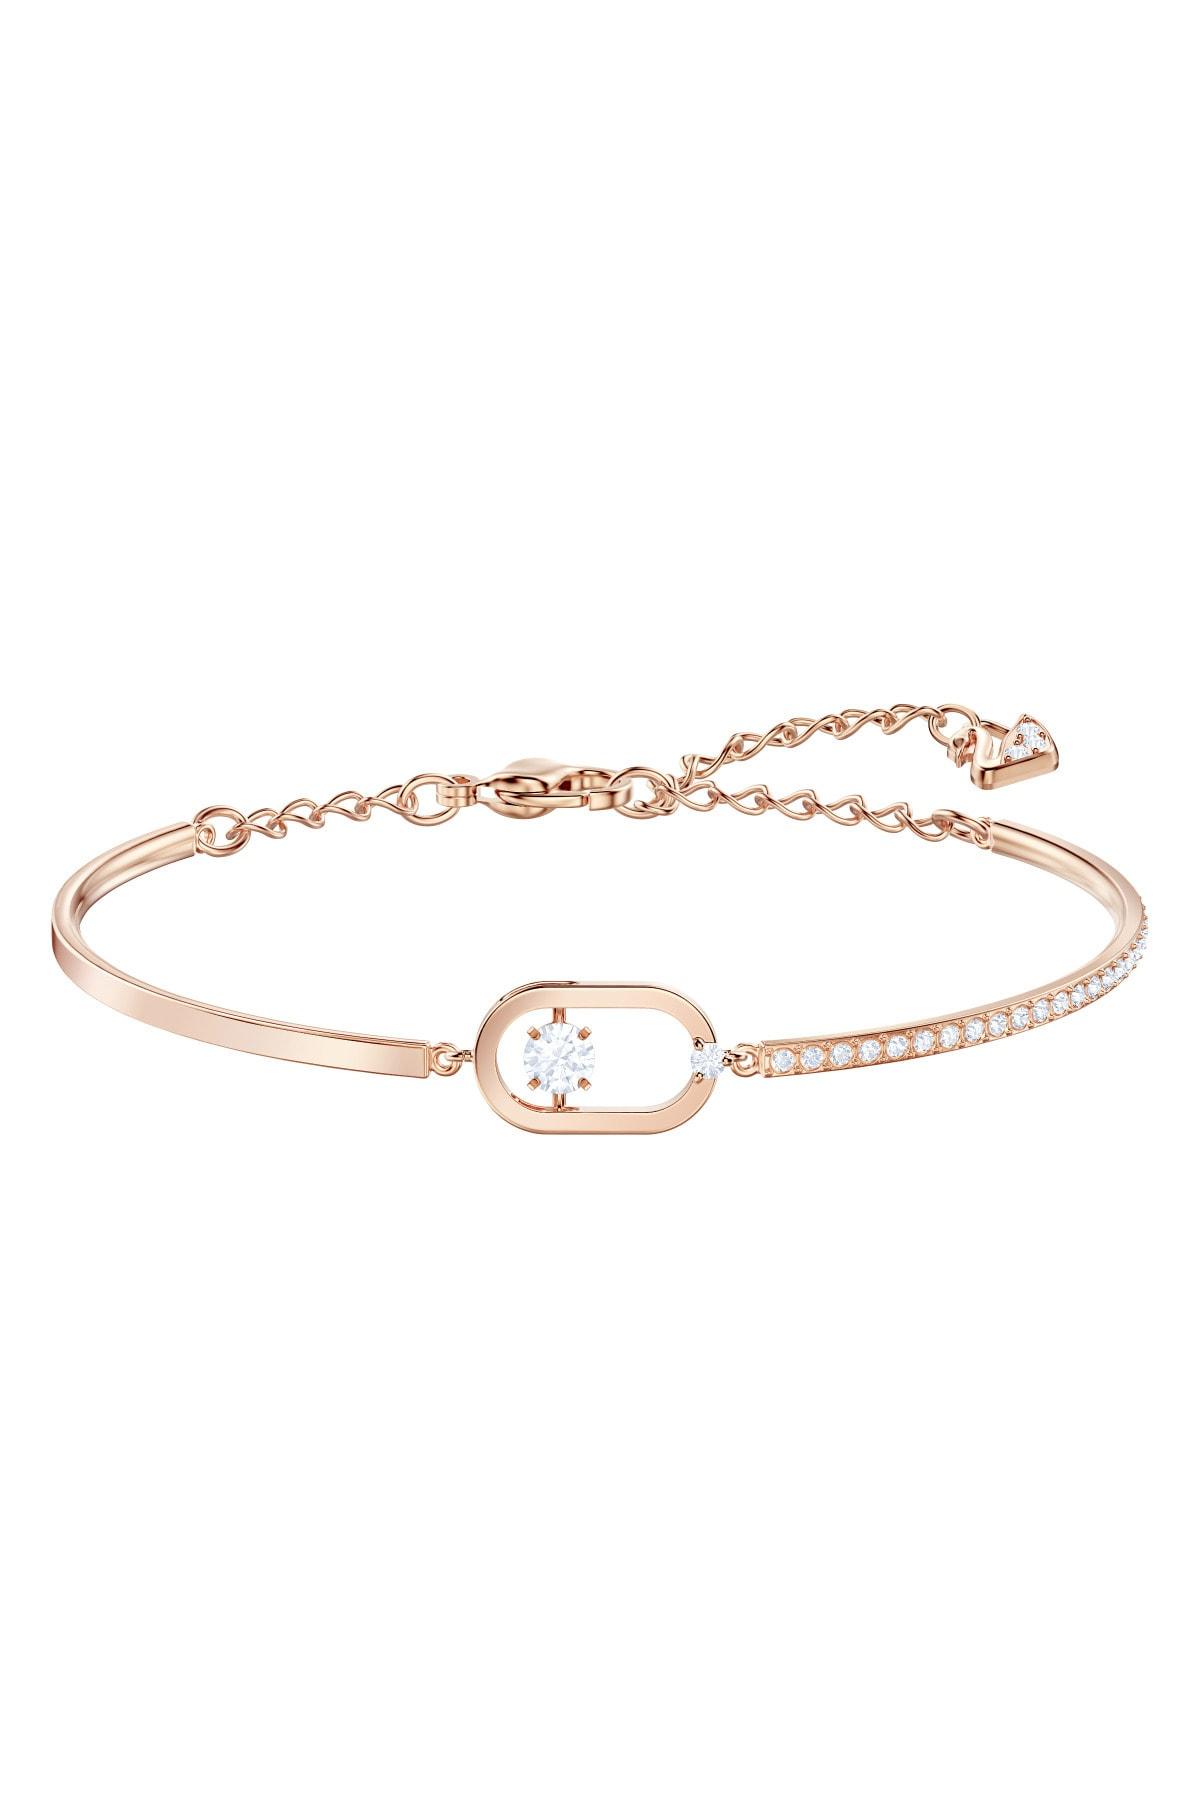 Swarovski 5472382 Bilezik North:bracelet Oval Pave Czwh/ros M 5472382 1